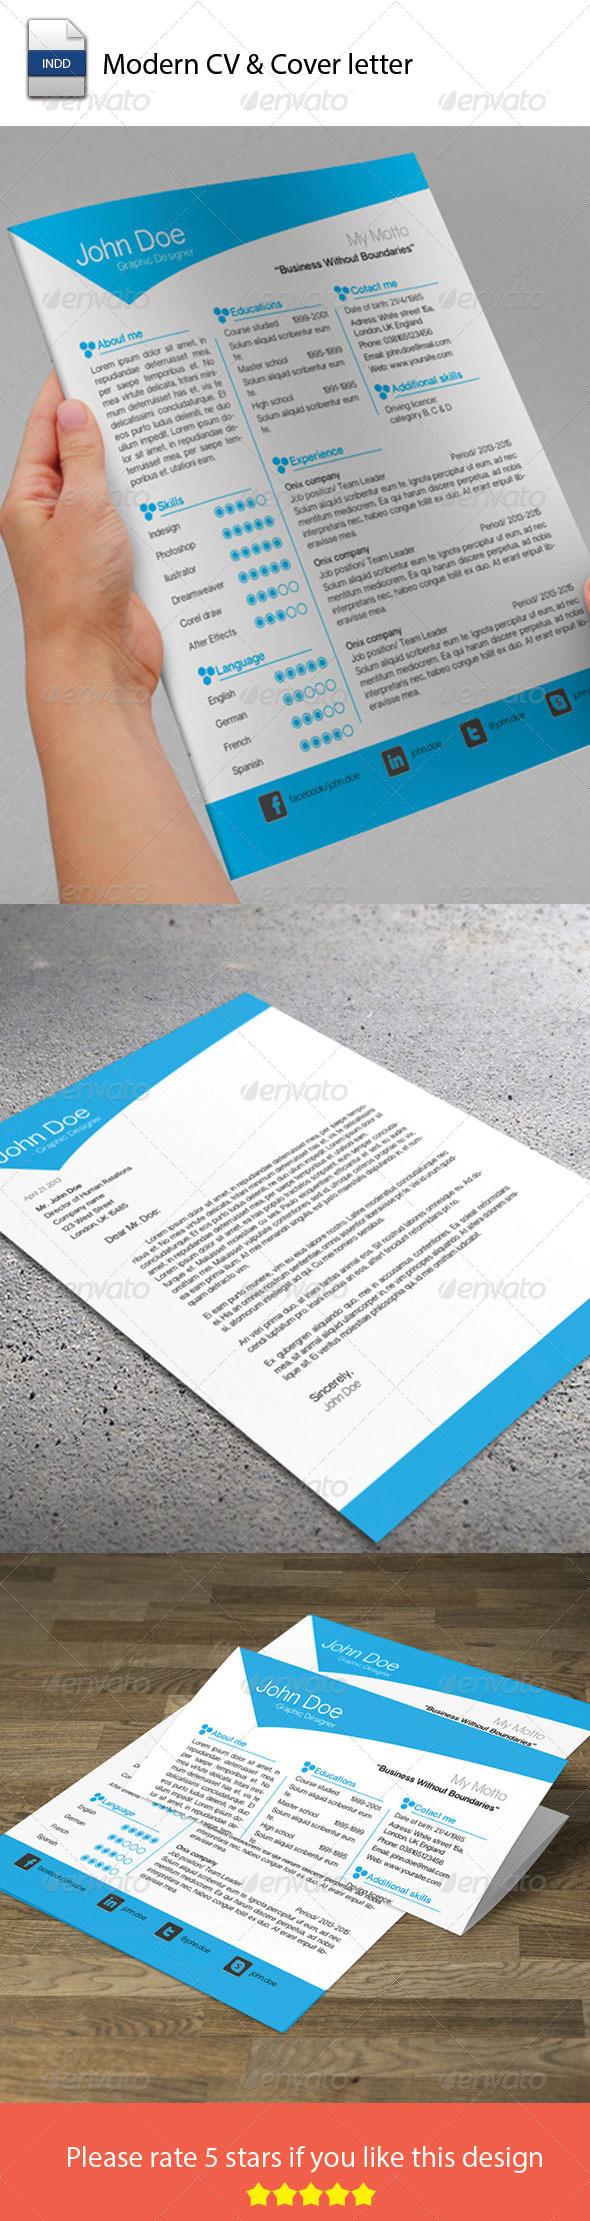 GraphicRiver Modern CV & Cover Letter 5821090